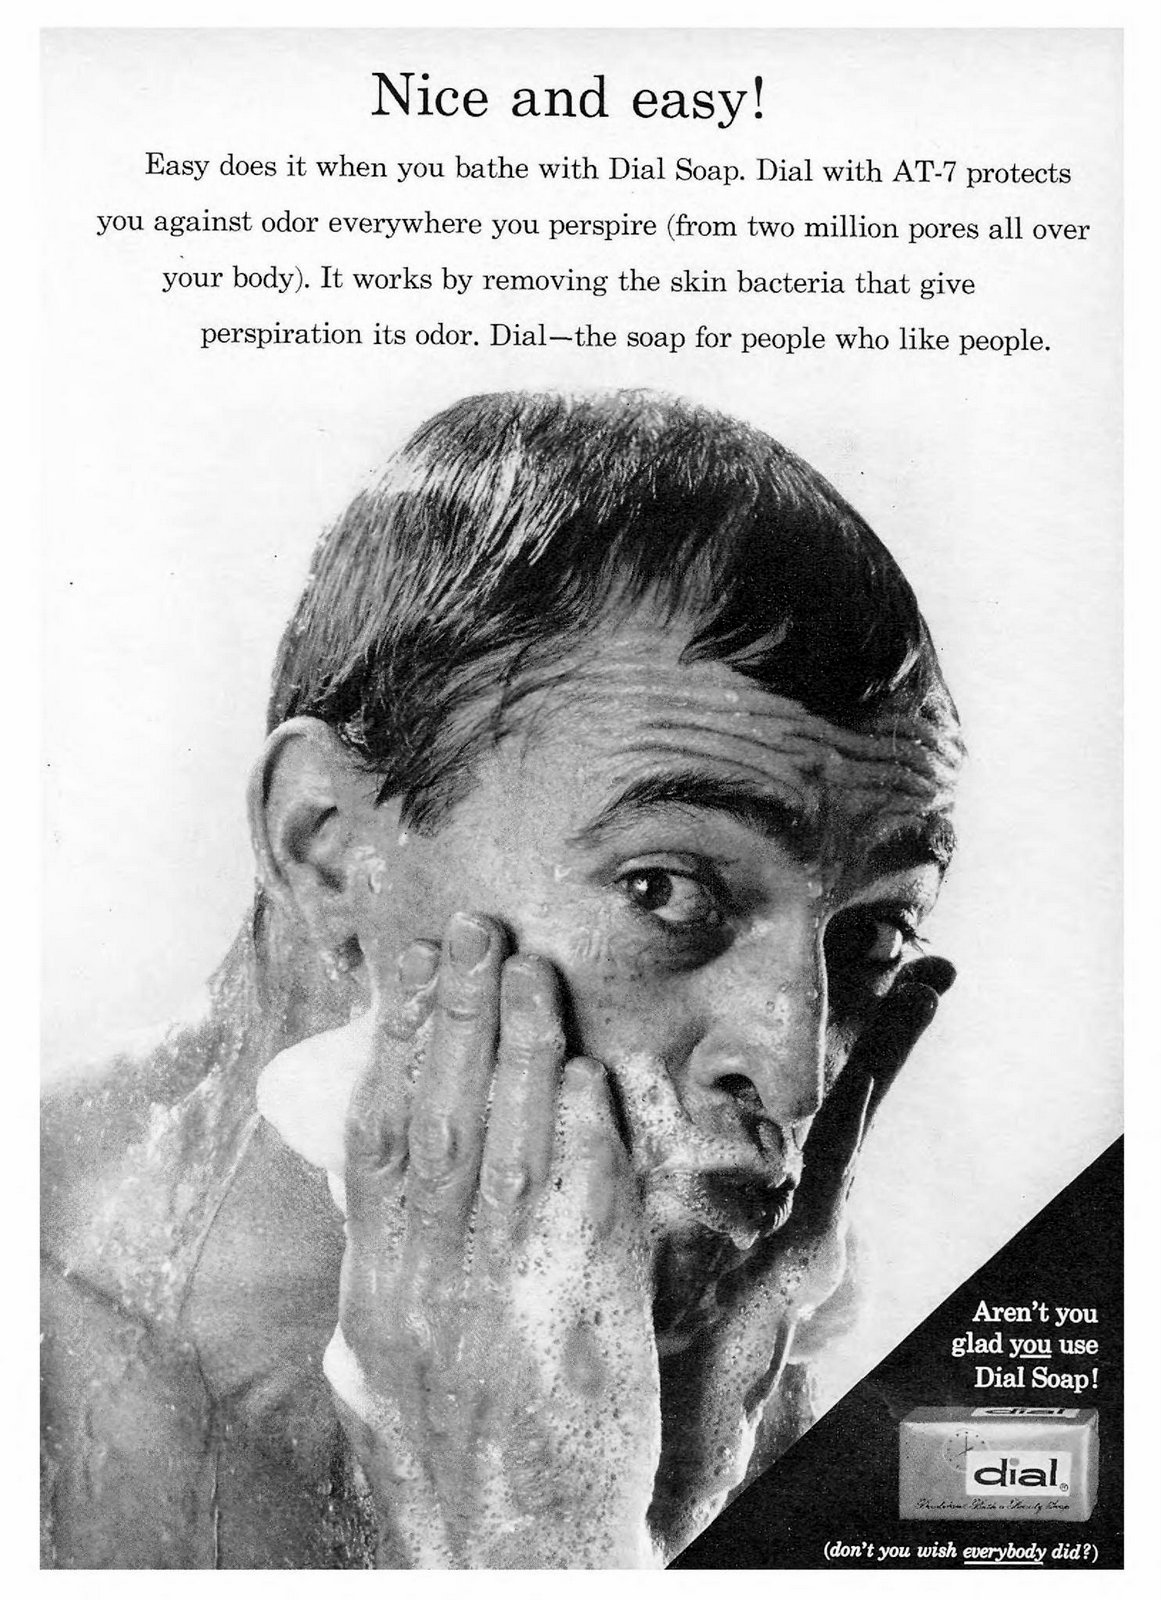 Vintage Dial Soap ad (1960)